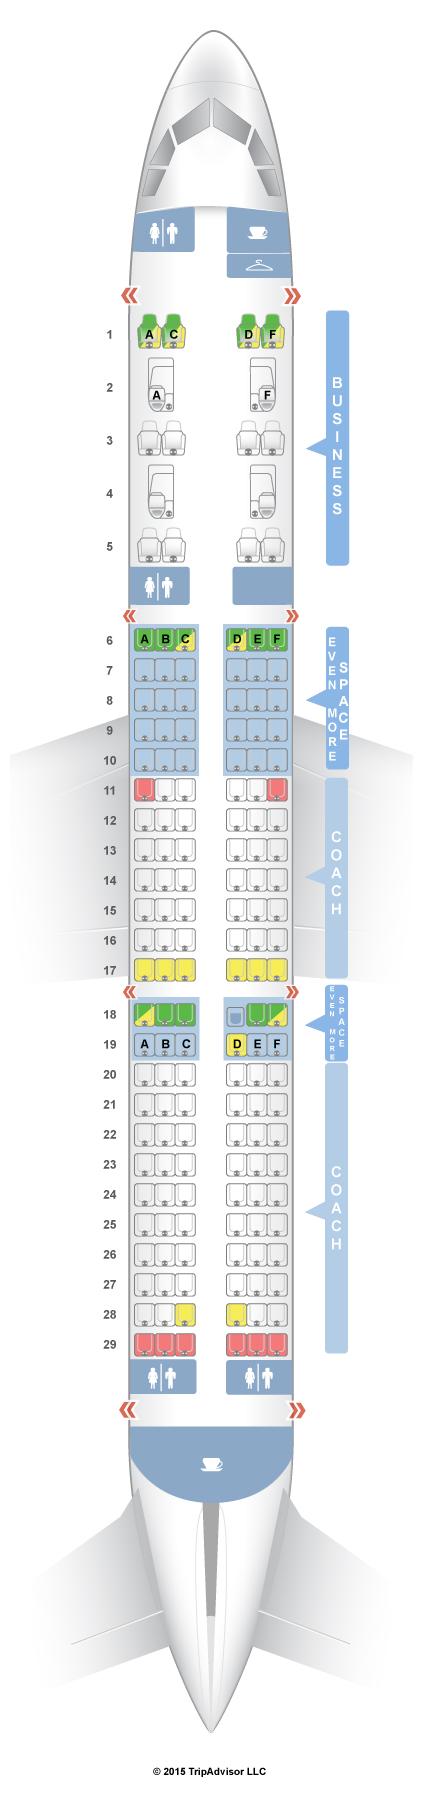 Jetblue_Airways_Airbus_A321_transcon.jpg